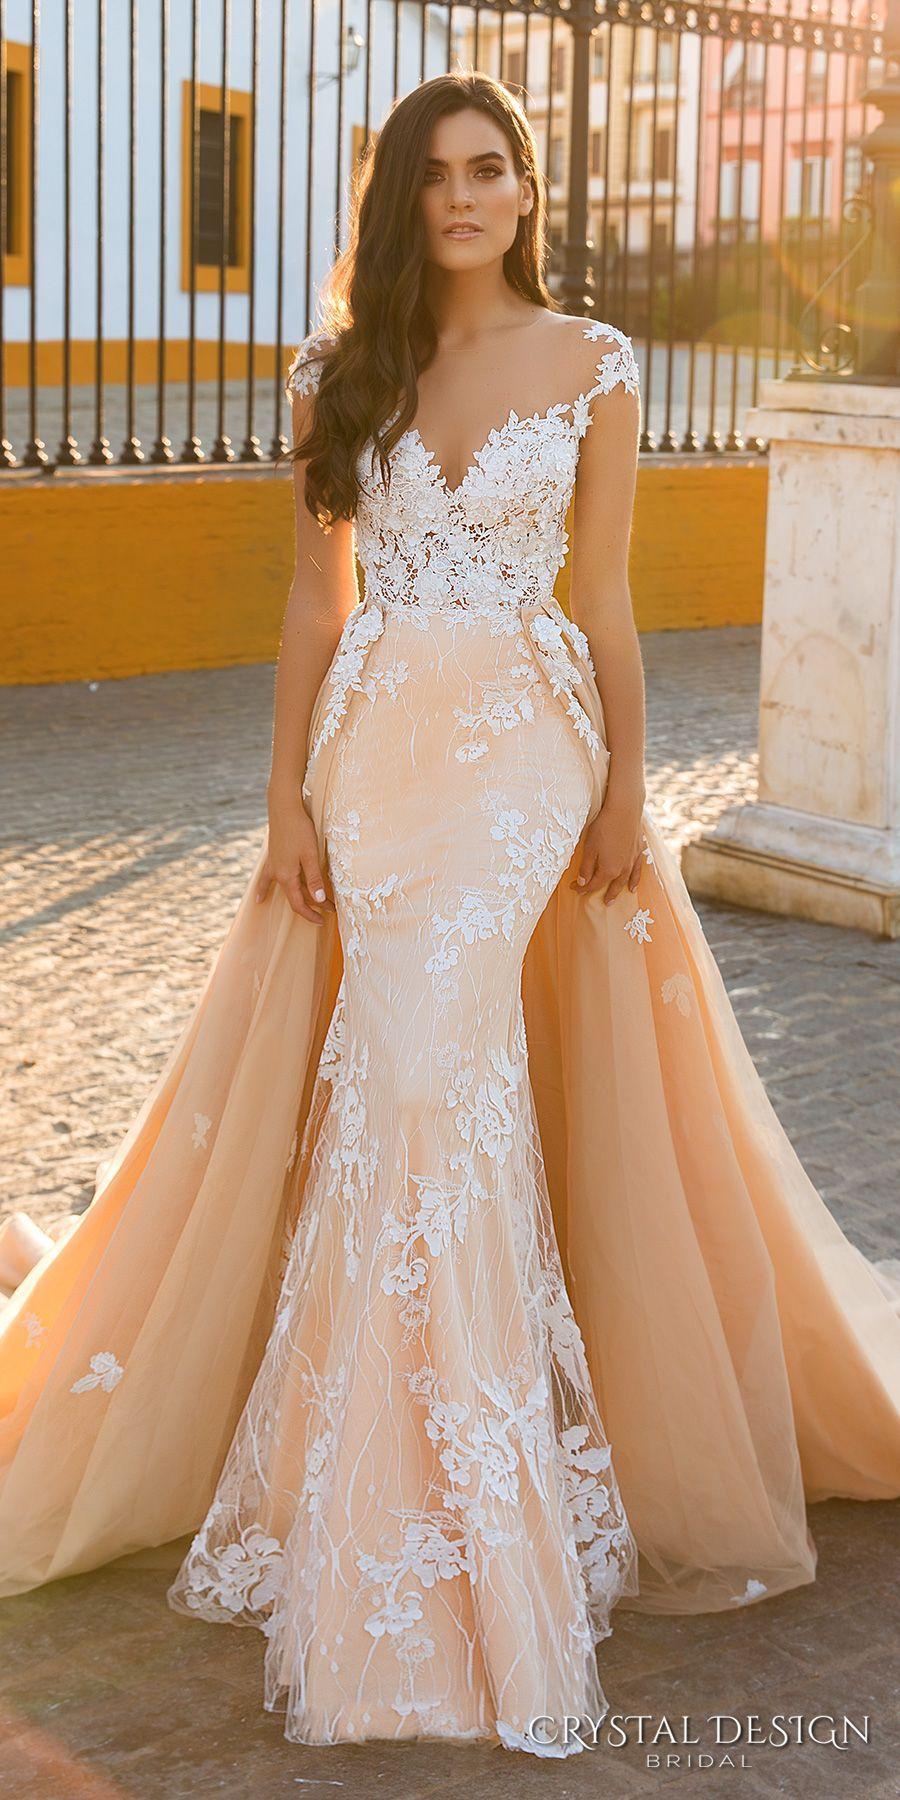 Crystal design bridal cap sleeves deep sweetheart neckline